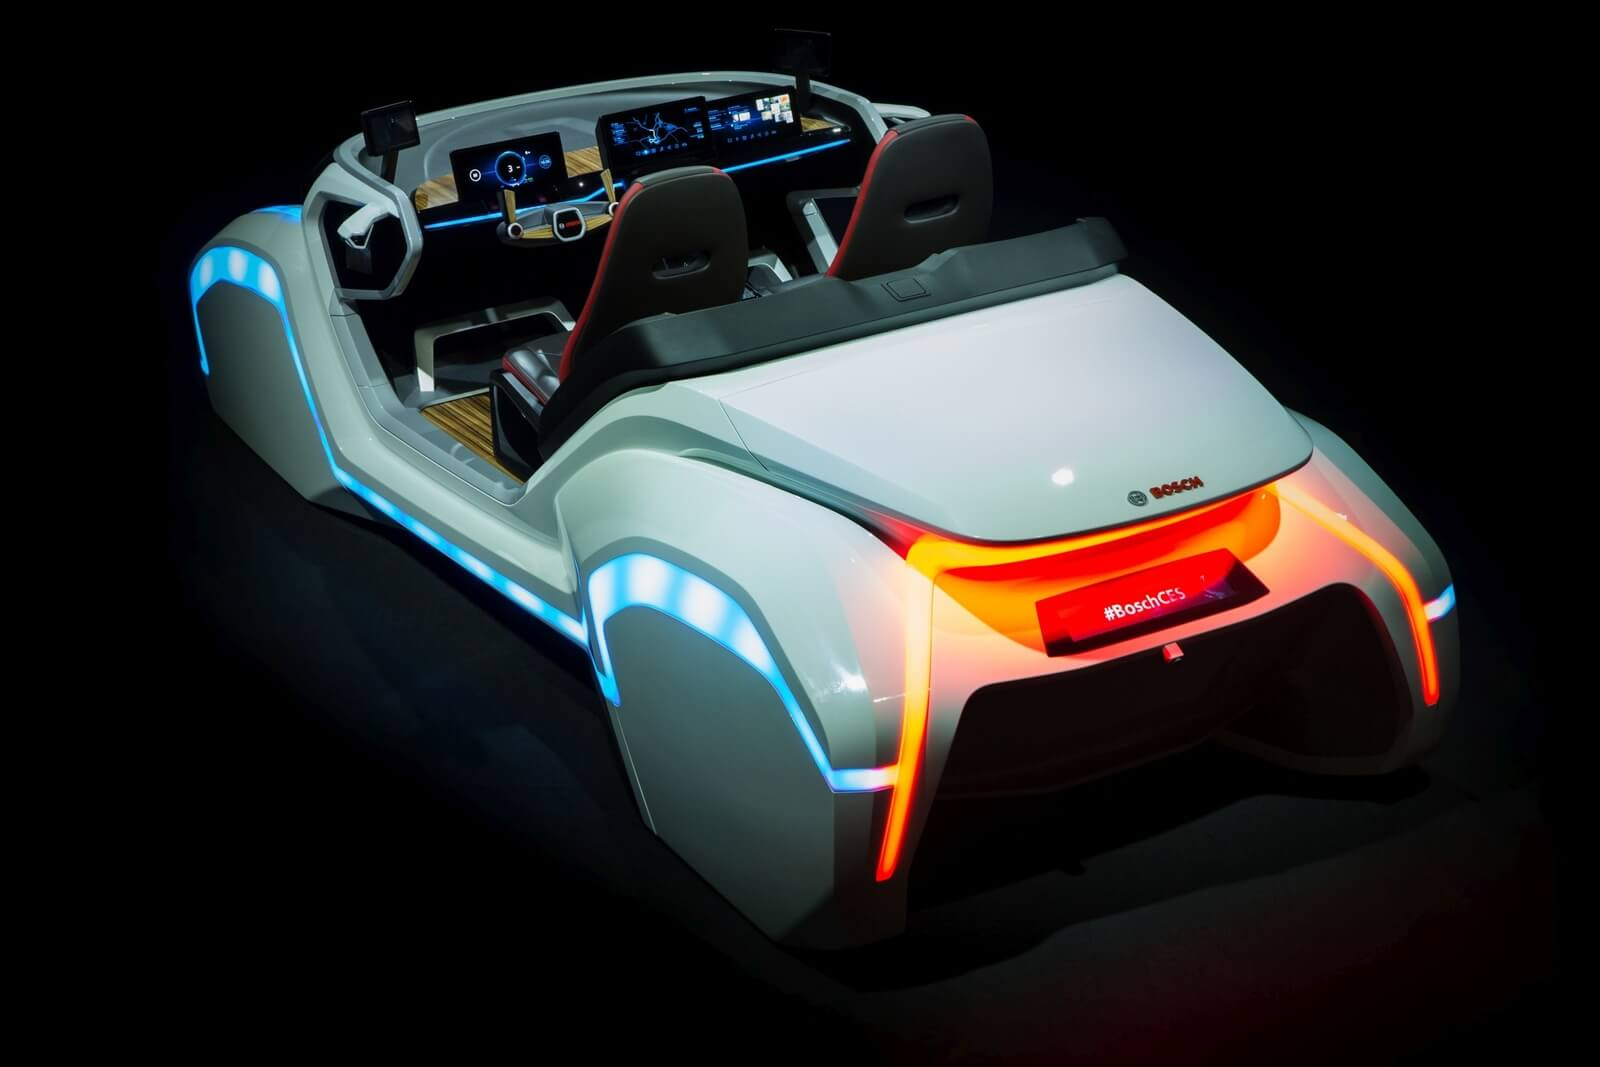 Connected Cars Konzept in Bosch Showcar auf CES 2017